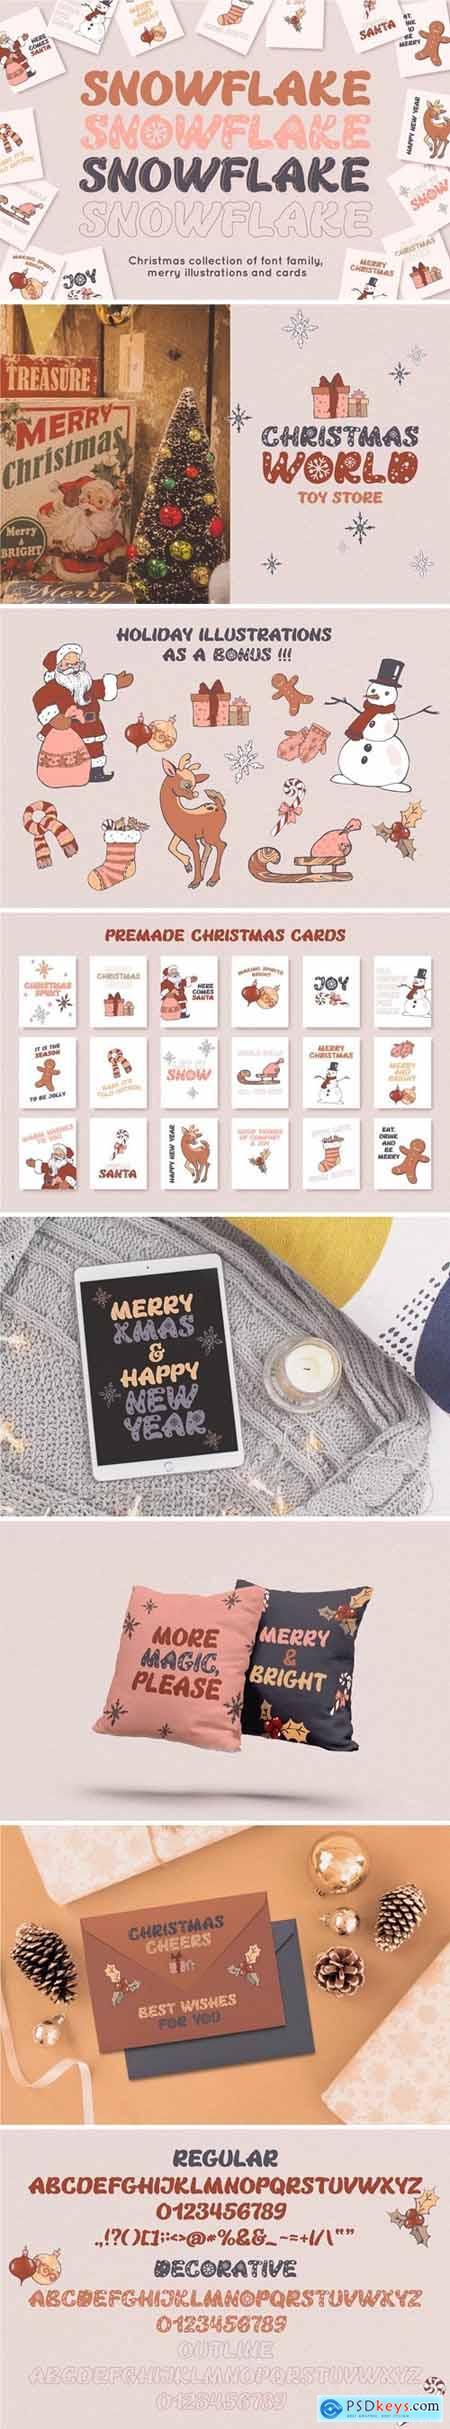 CreativeMarket - Snowflake Christmas font family 5539934